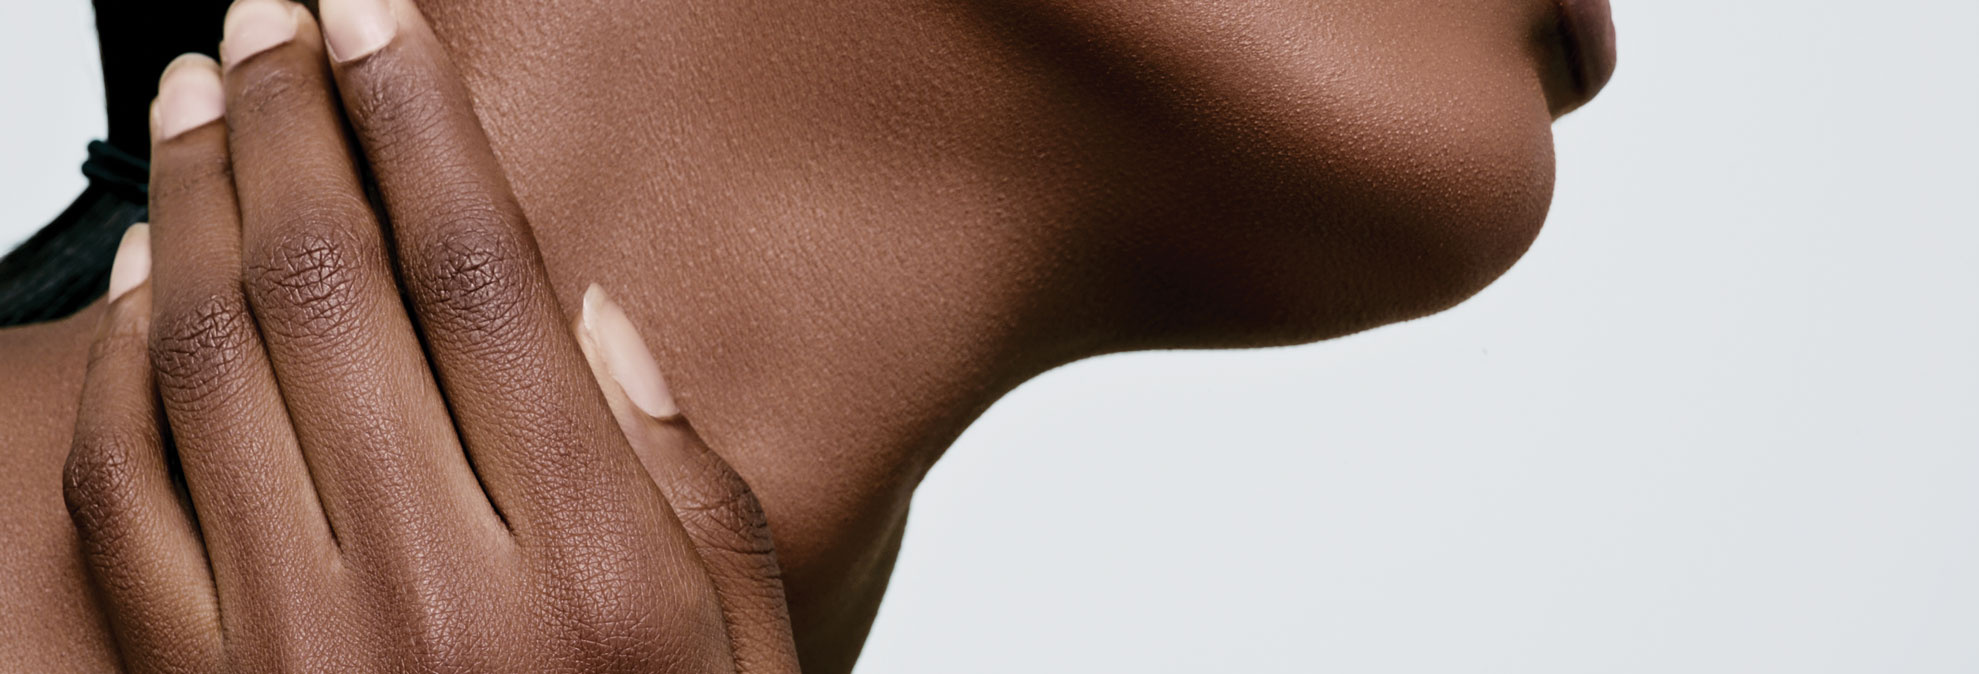 Do You Really Have Hypothyroidism?